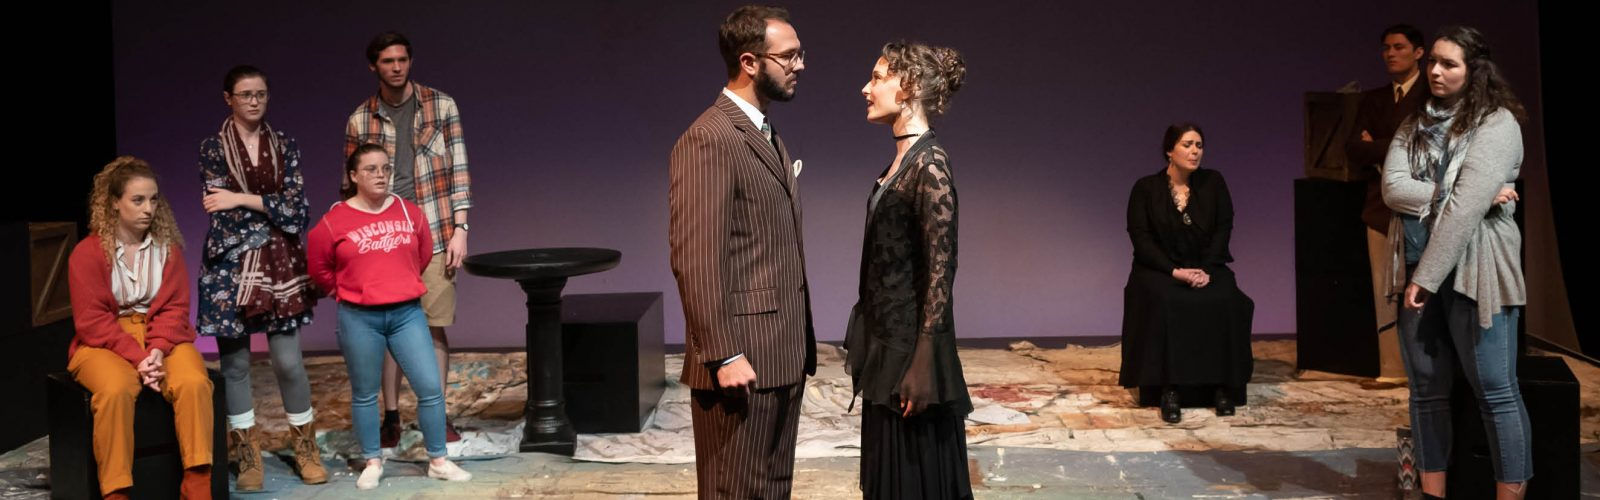 Home - Theatre and Drama